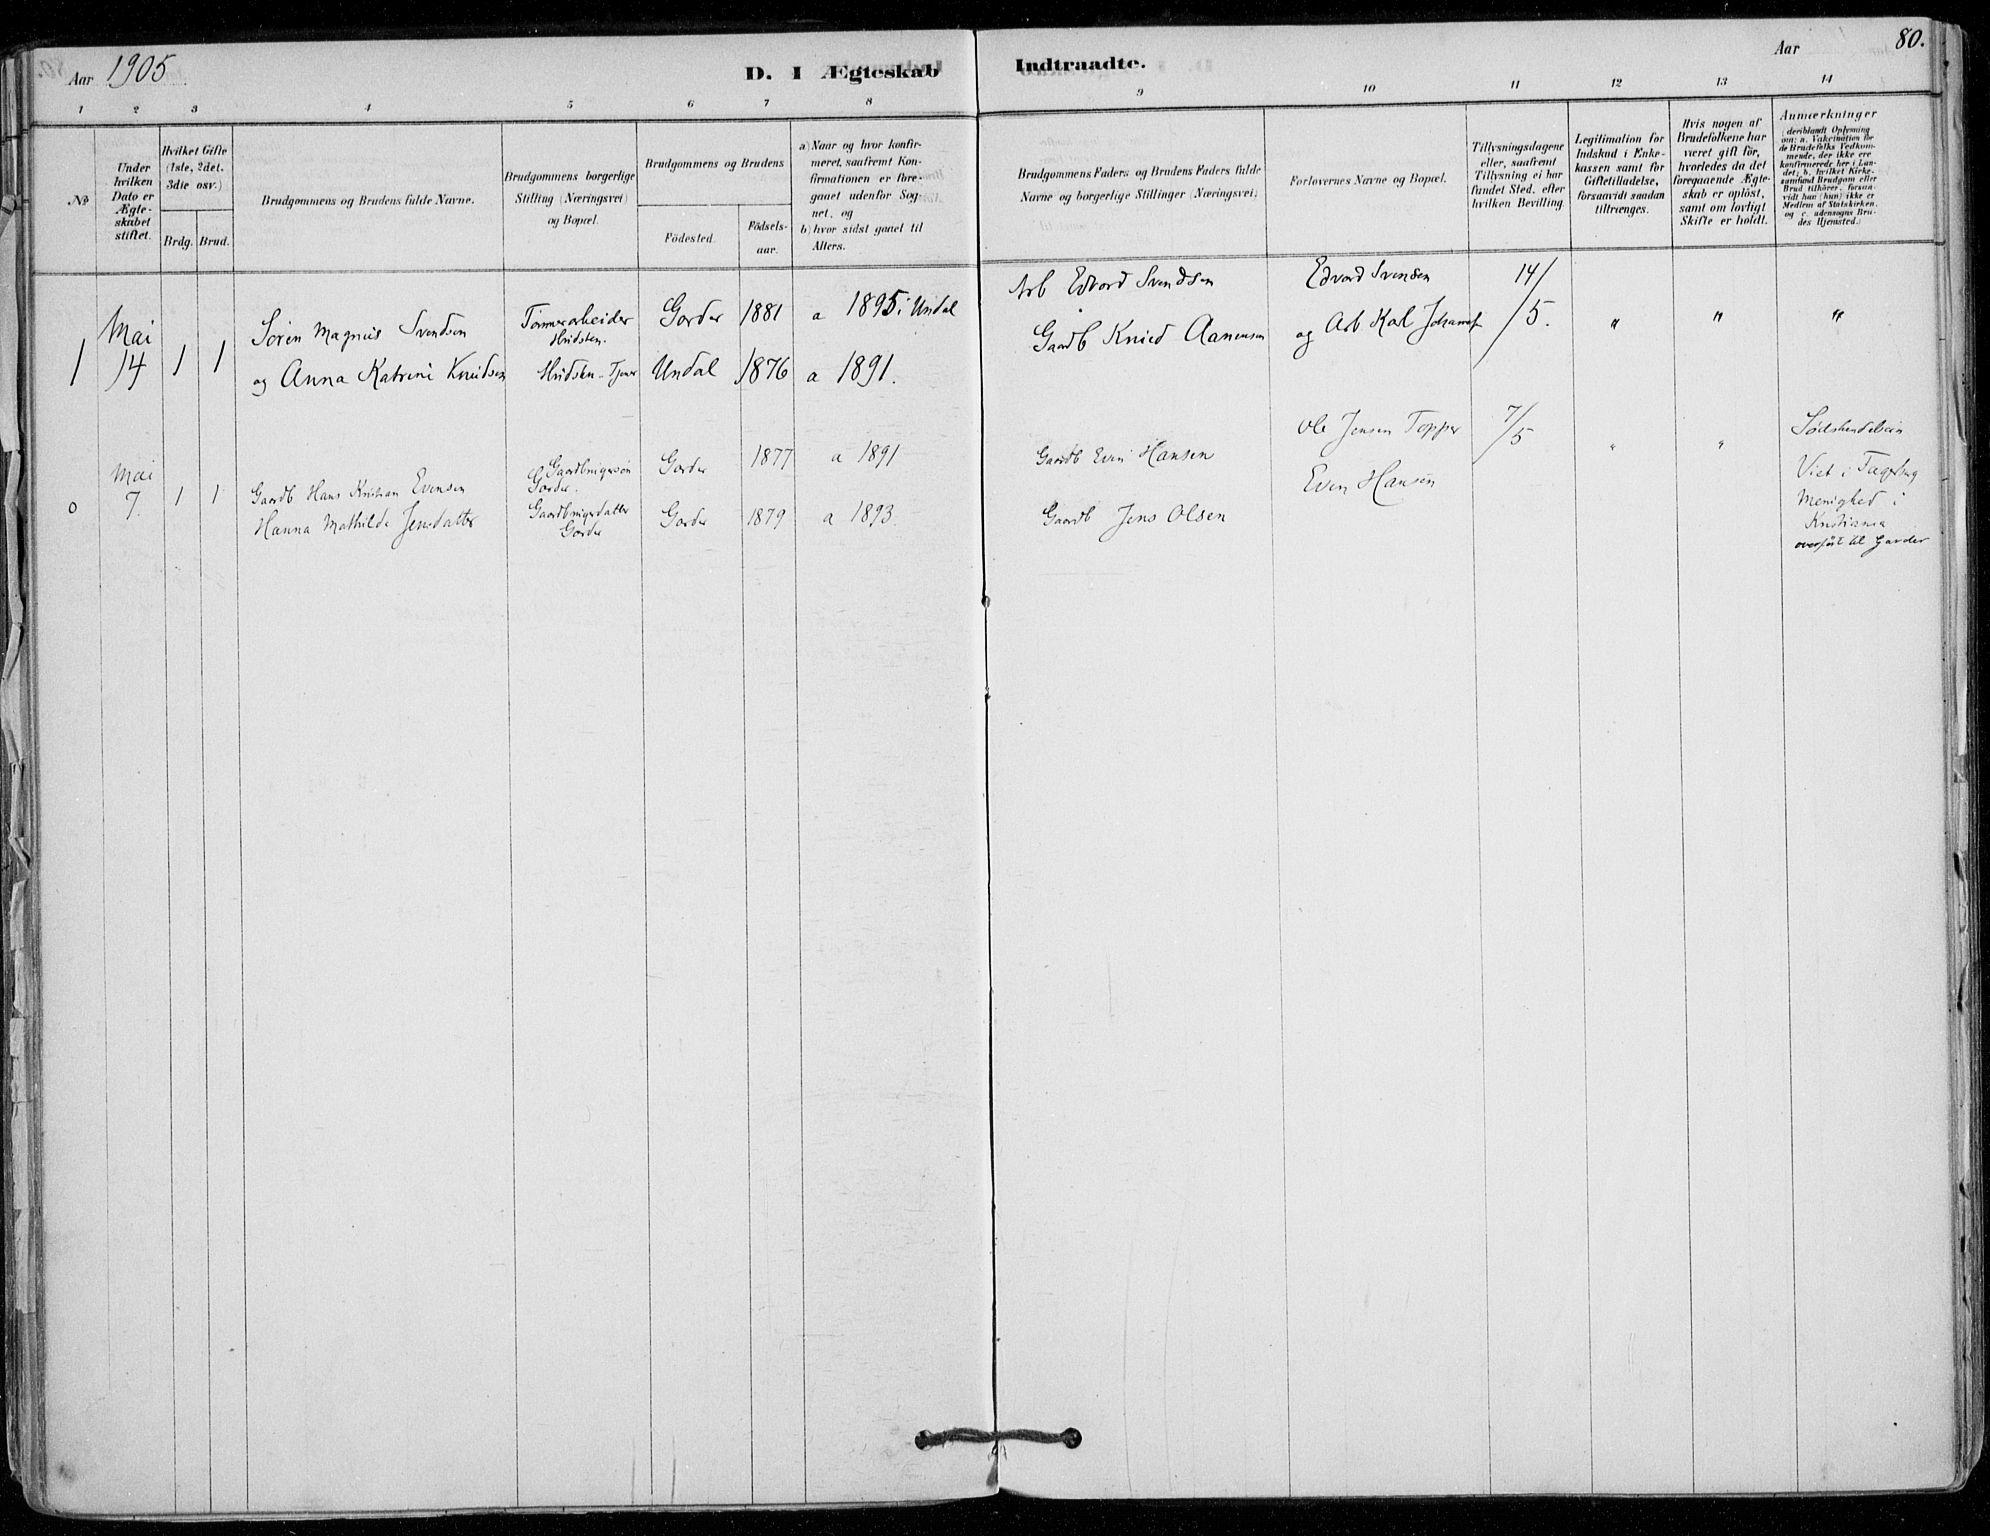 SAO, Vestby prestekontor Kirkebøker, F/Fd/L0001: Ministerialbok nr. IV 1, 1878-1945, s. 80